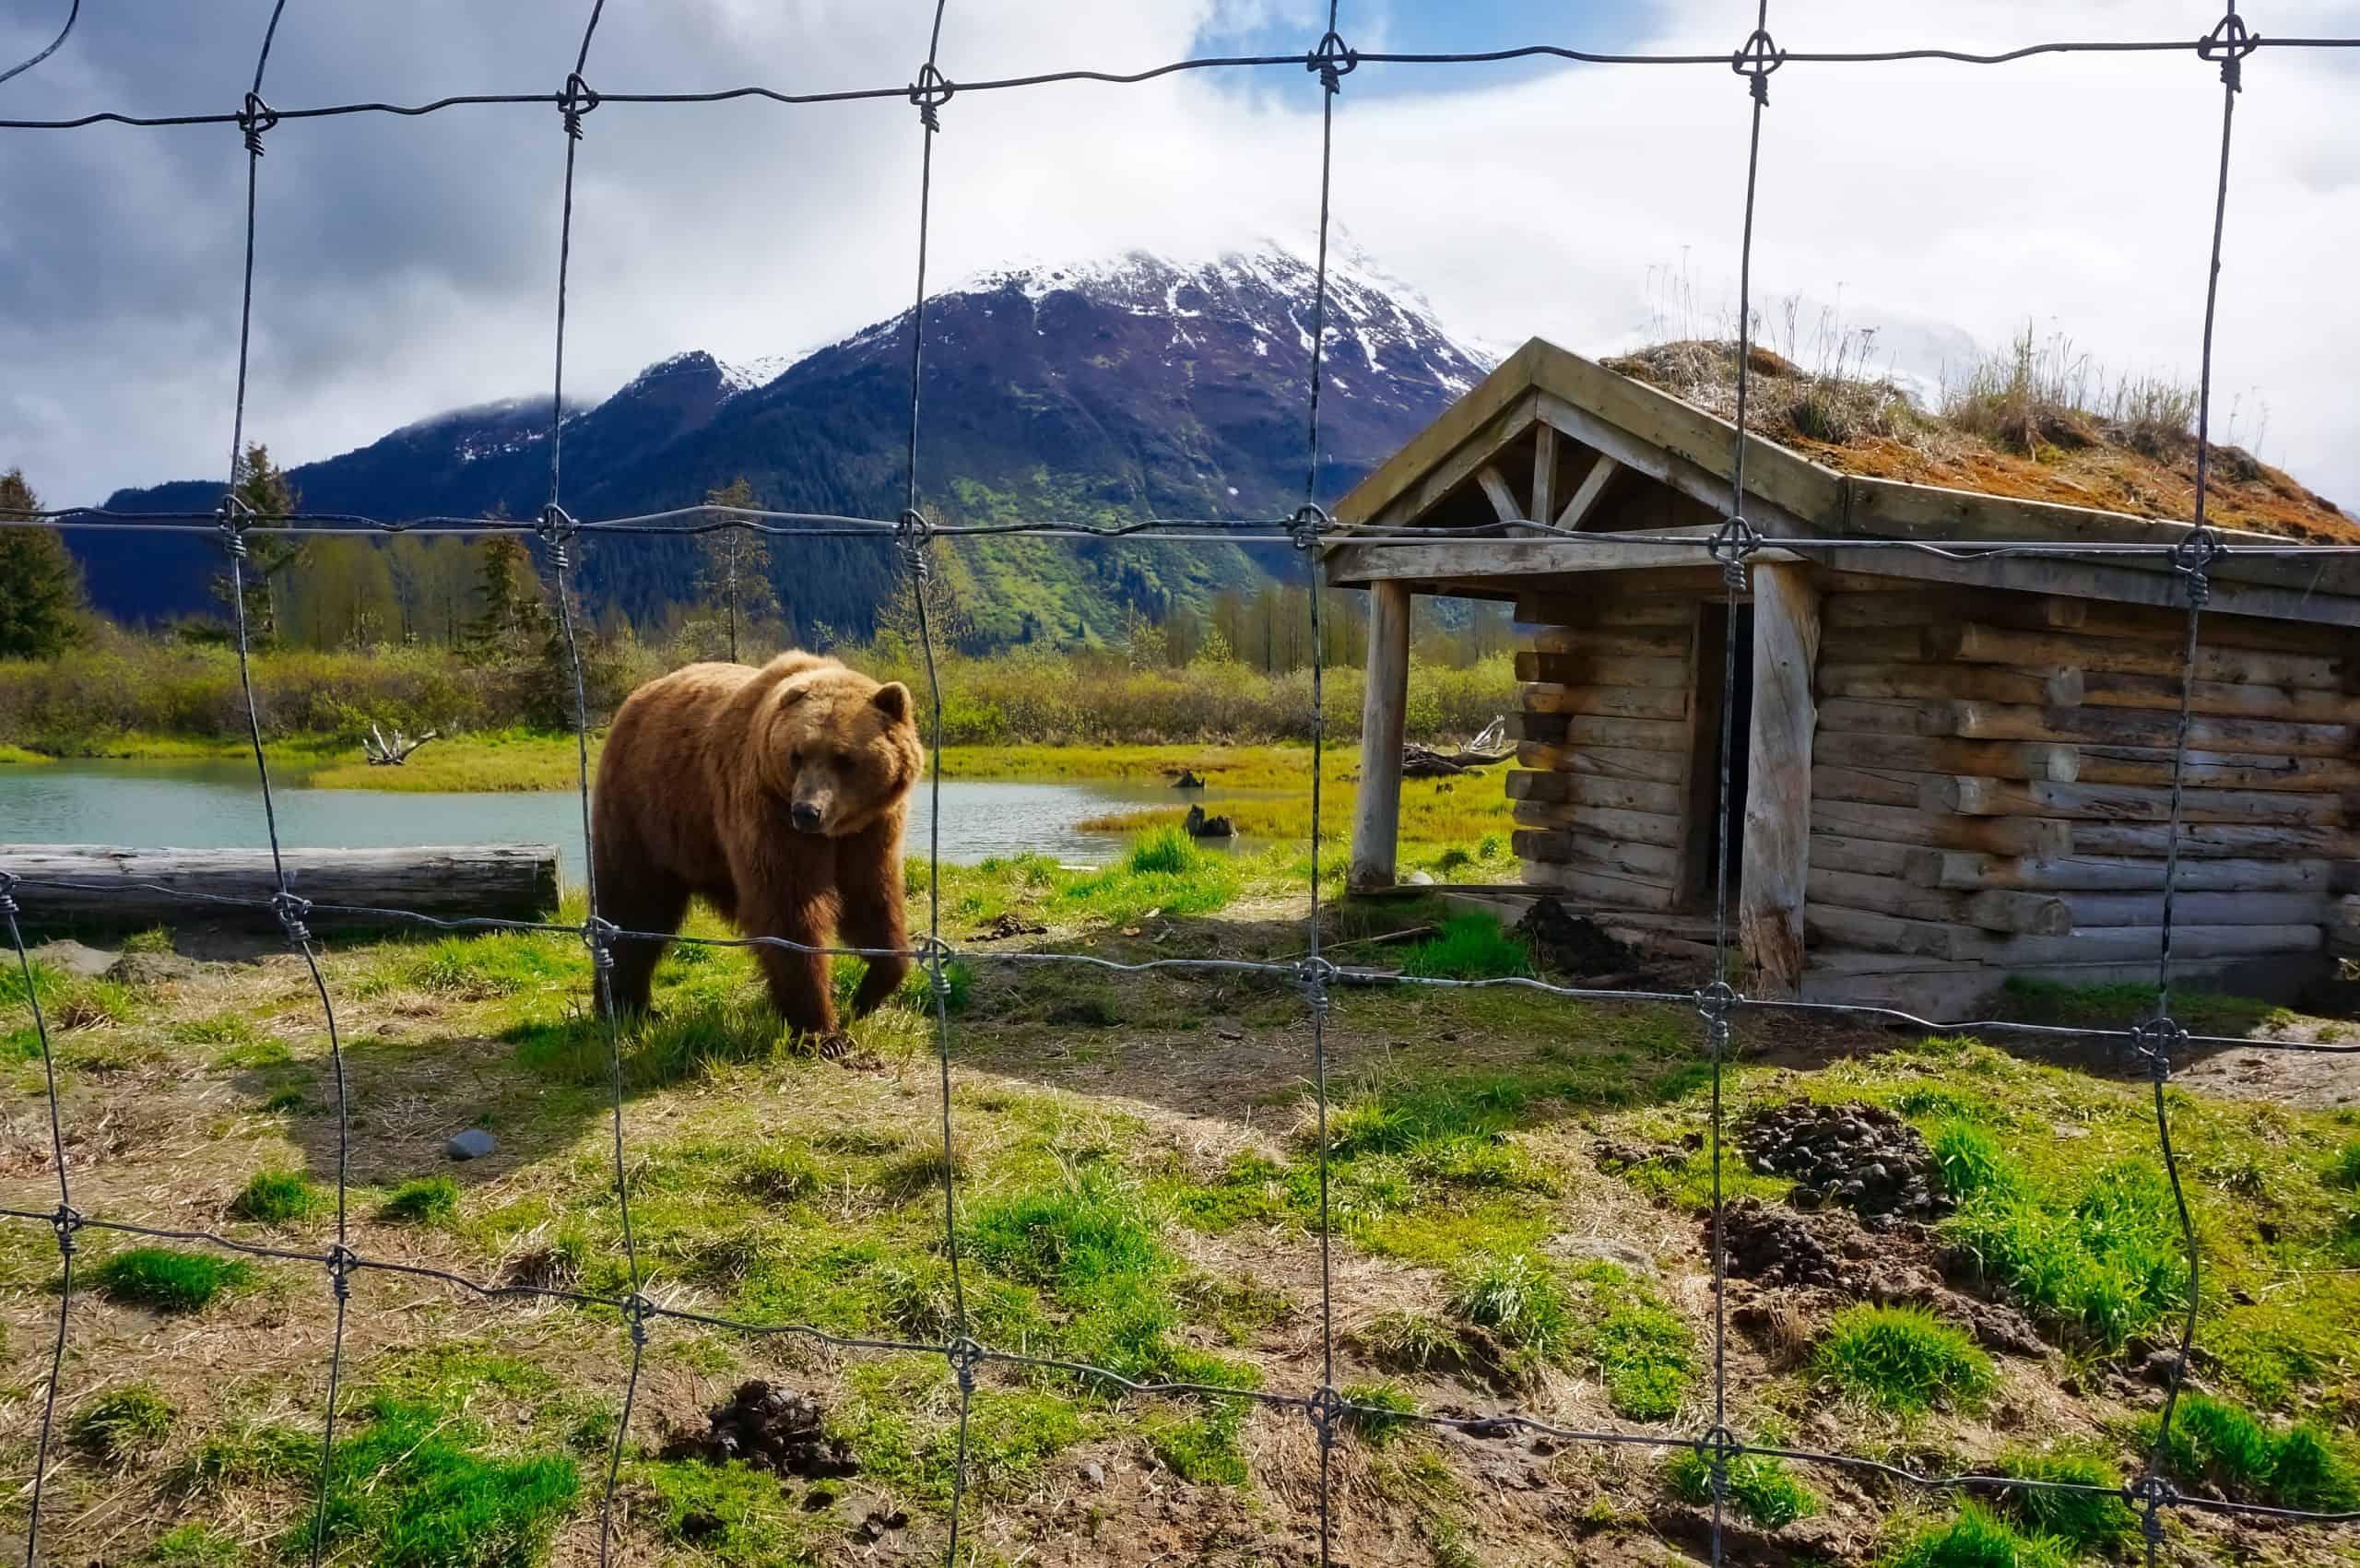 Alaska's Big 5 - Grizzly at Alaska Wildlife Conservation Center